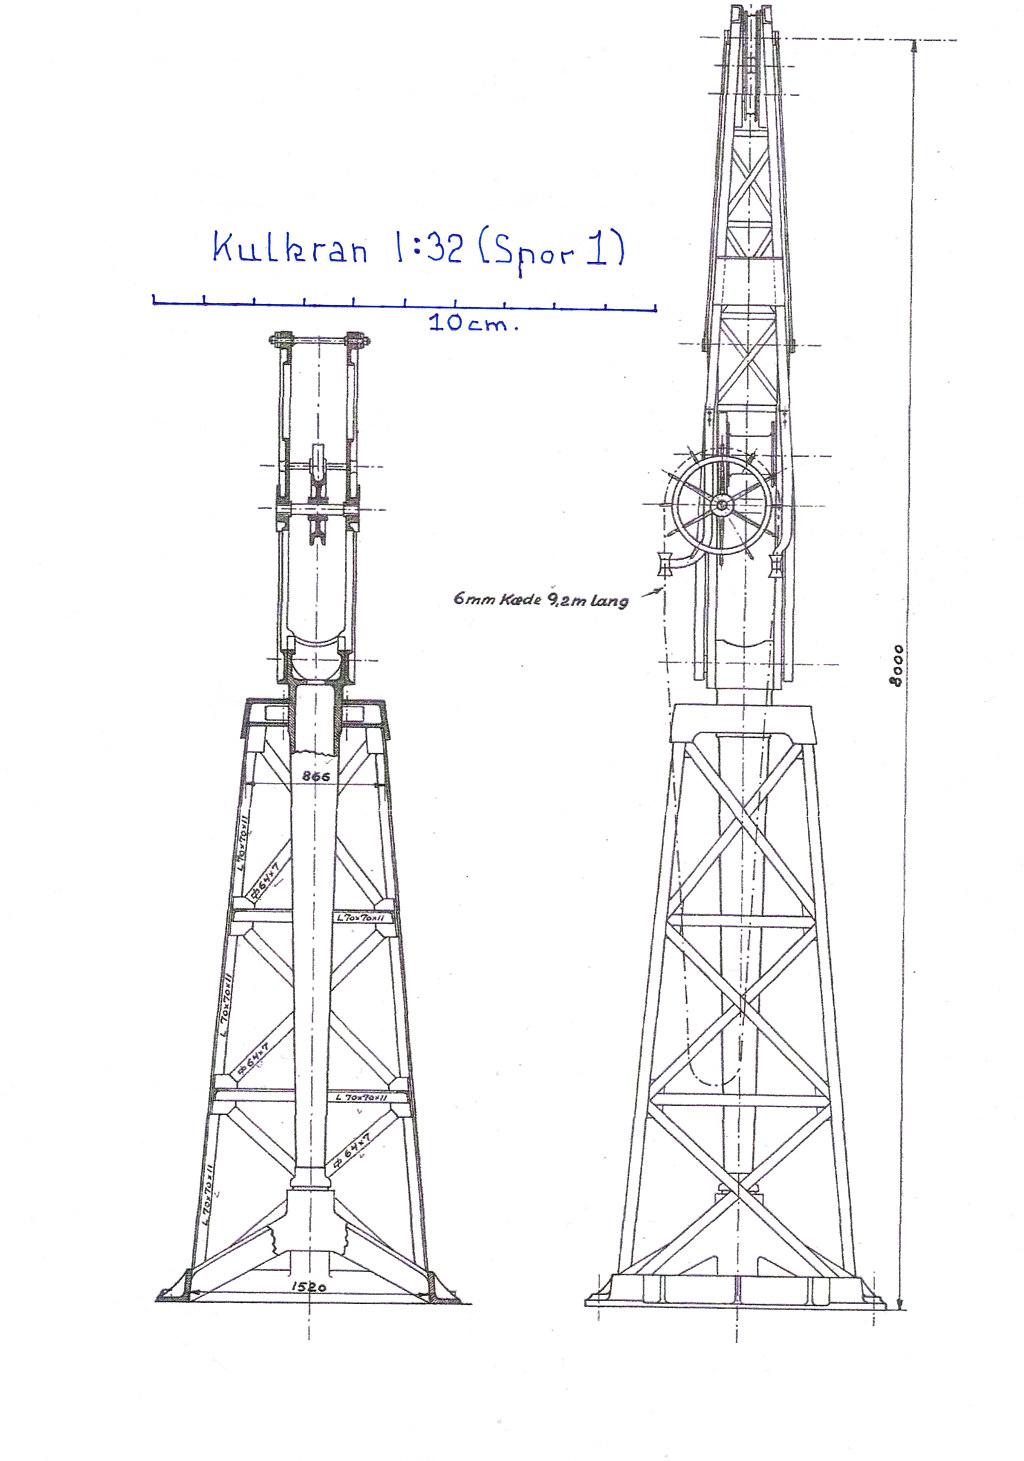 DSB Kulkran